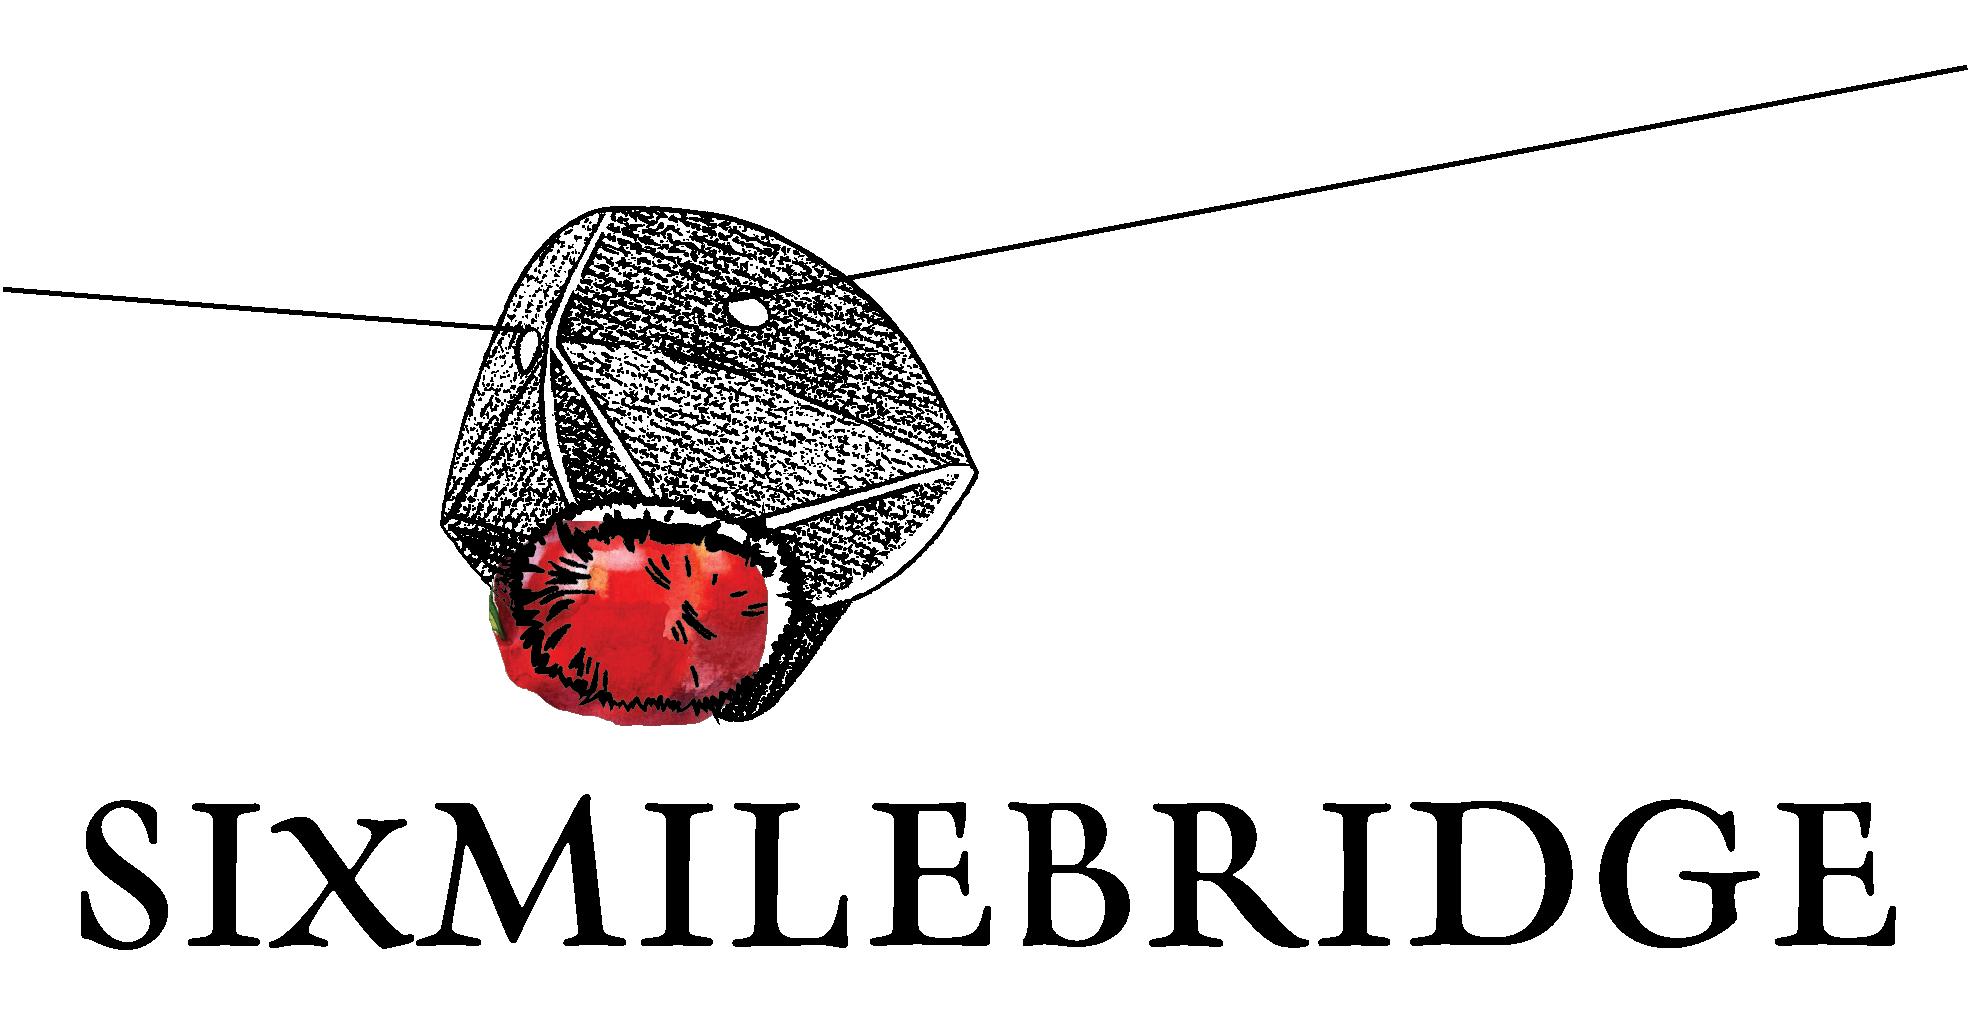 Full Smb Logo